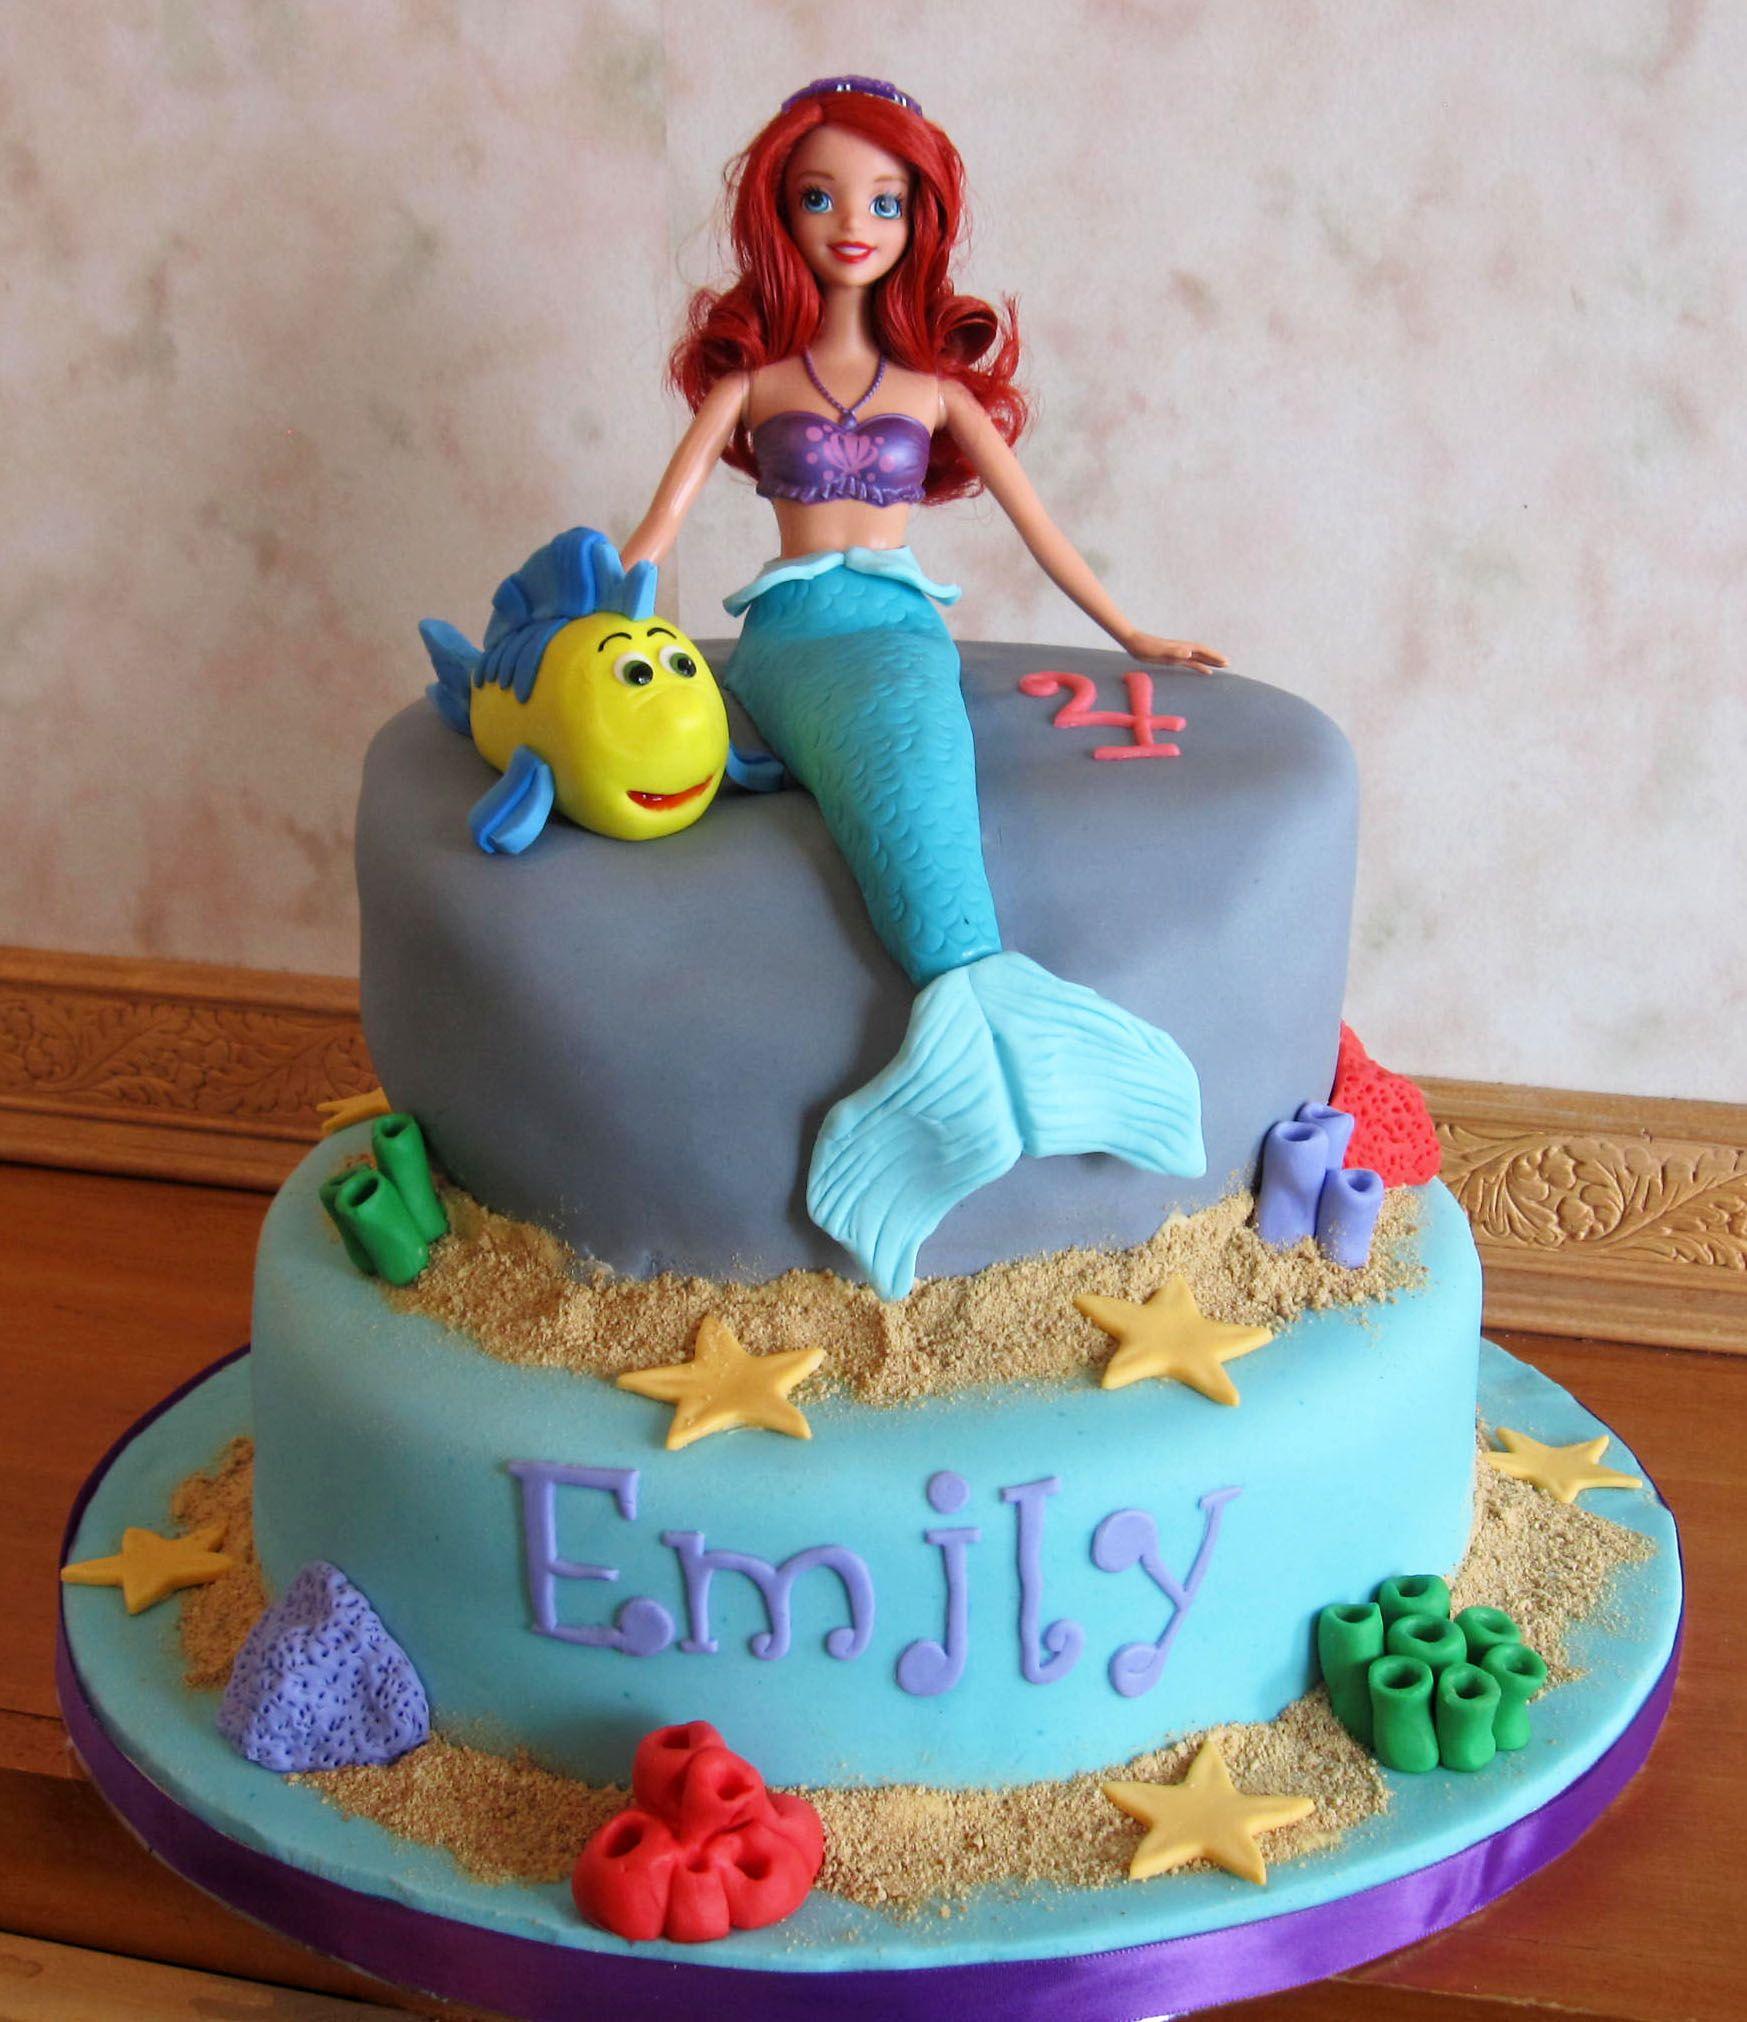 Ariel 4th Birthday Cake With Flounder